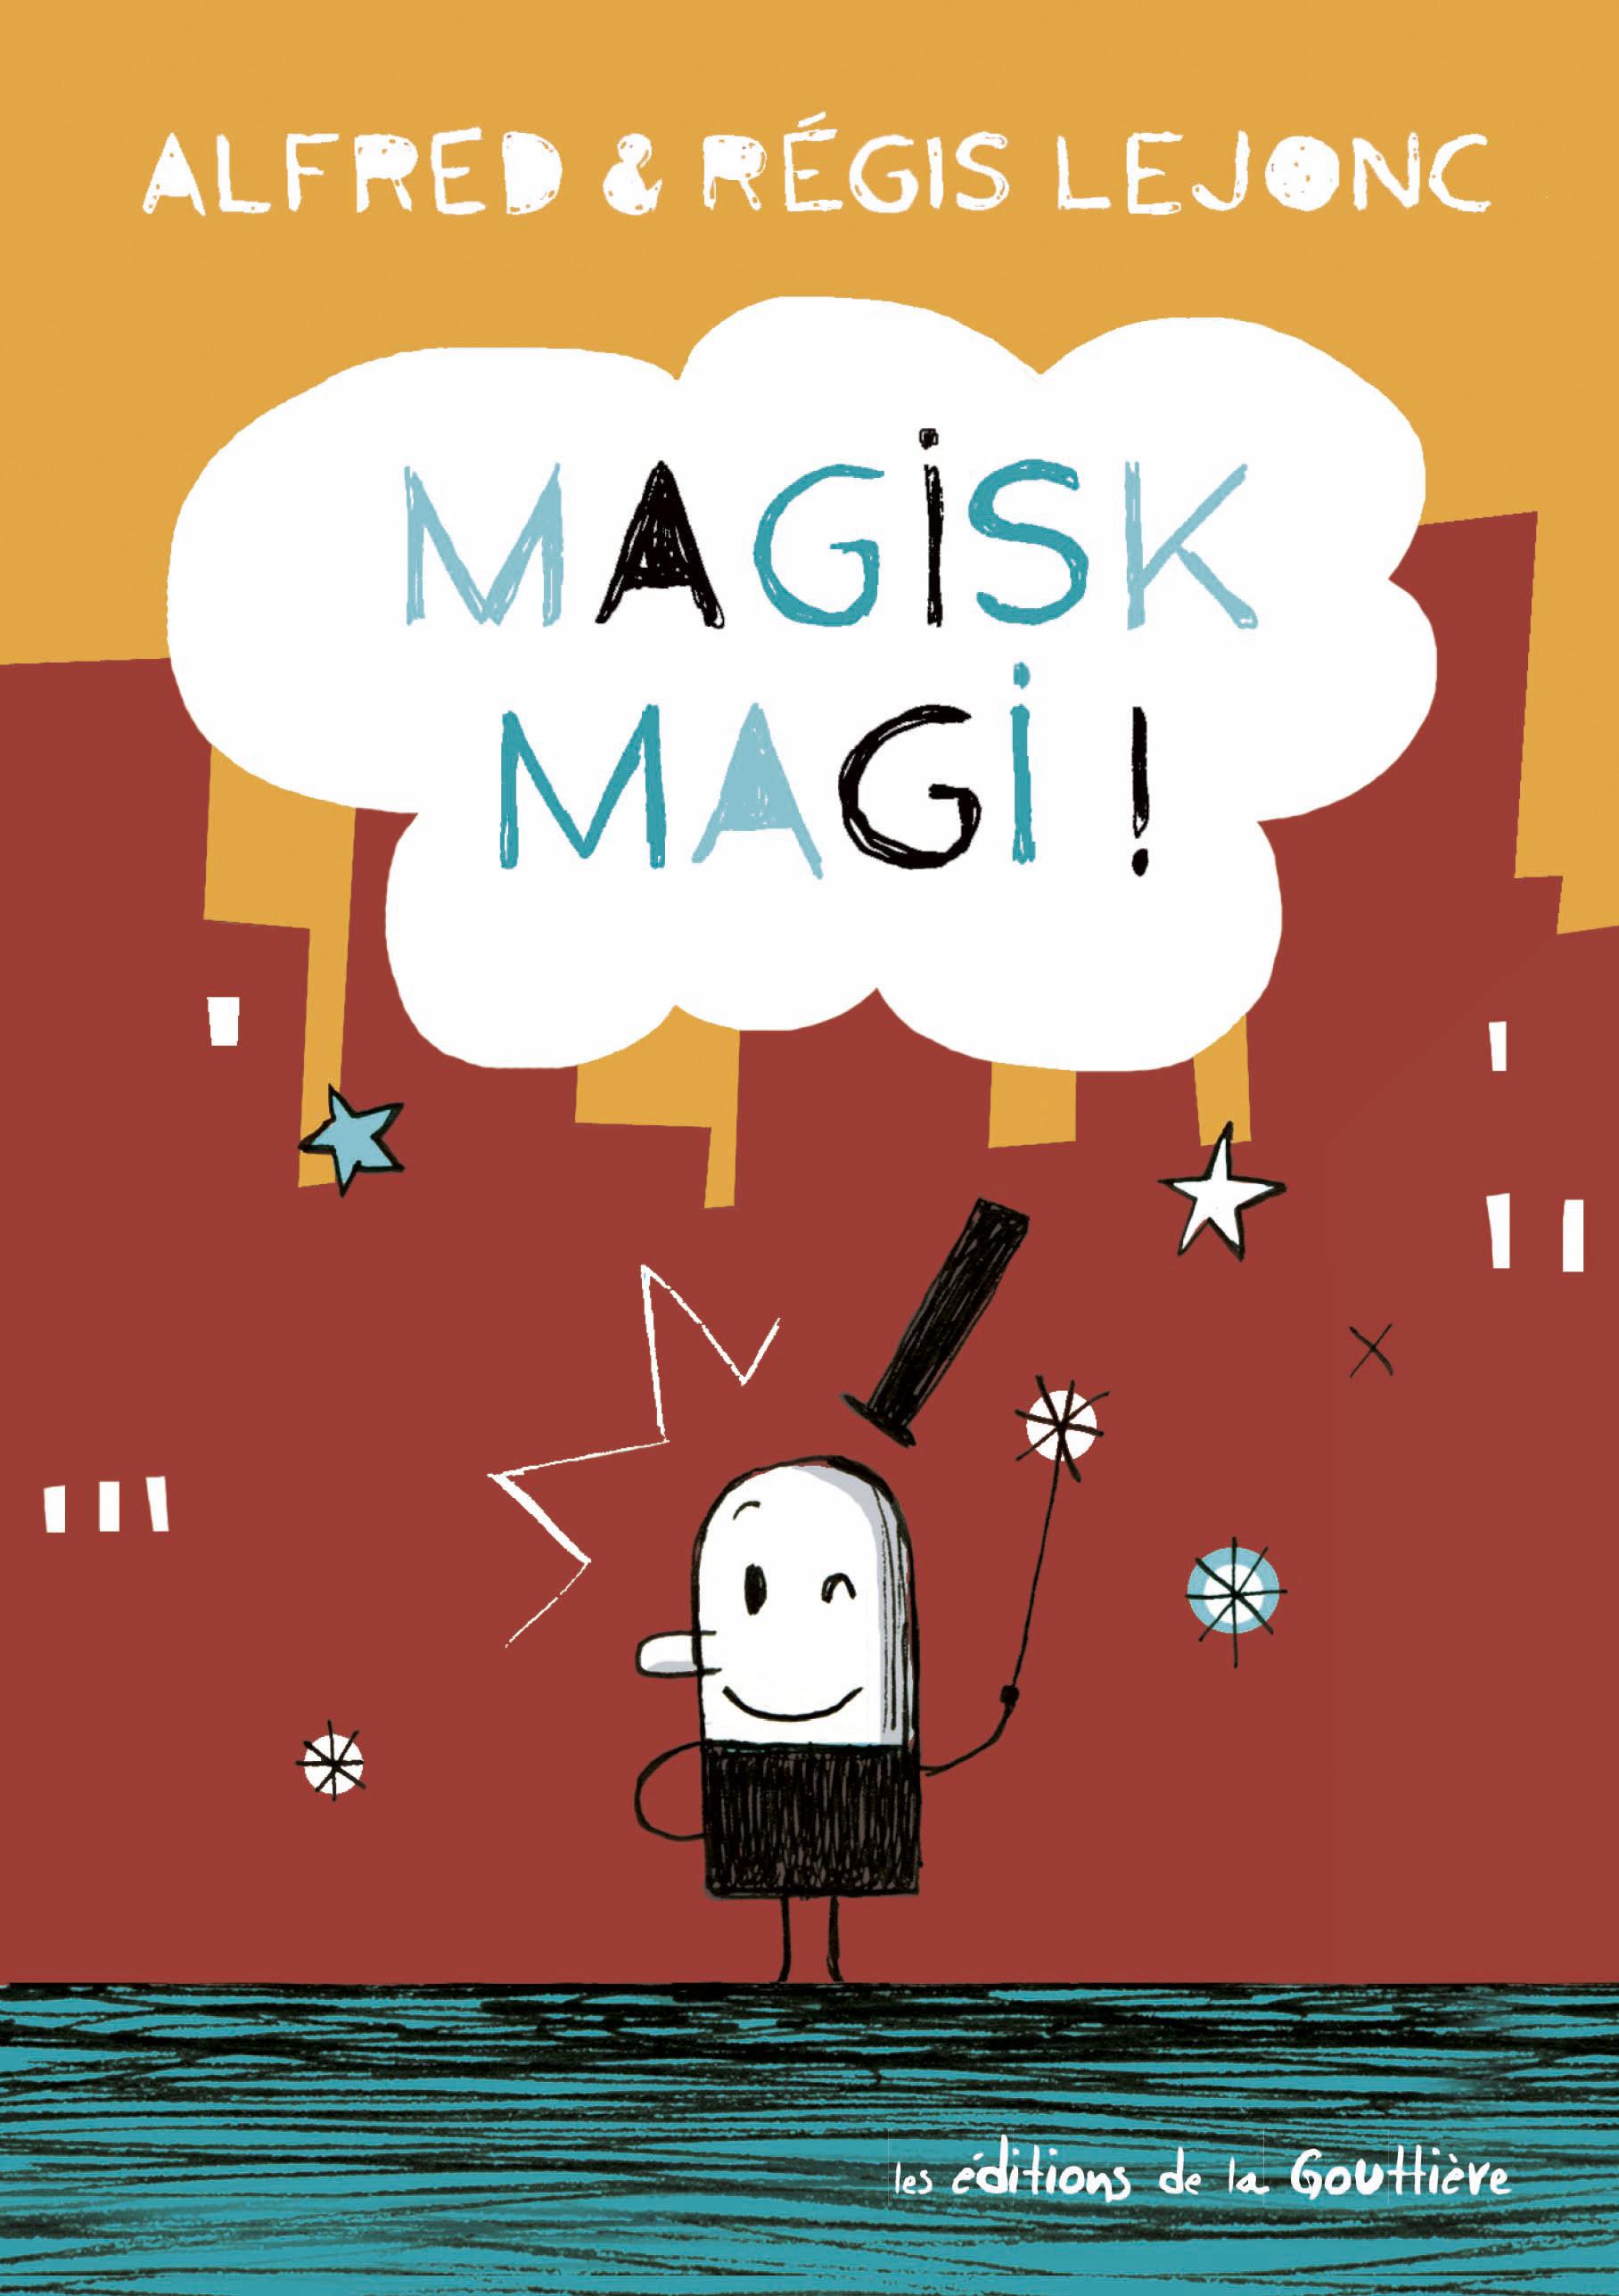 Magisk Magi